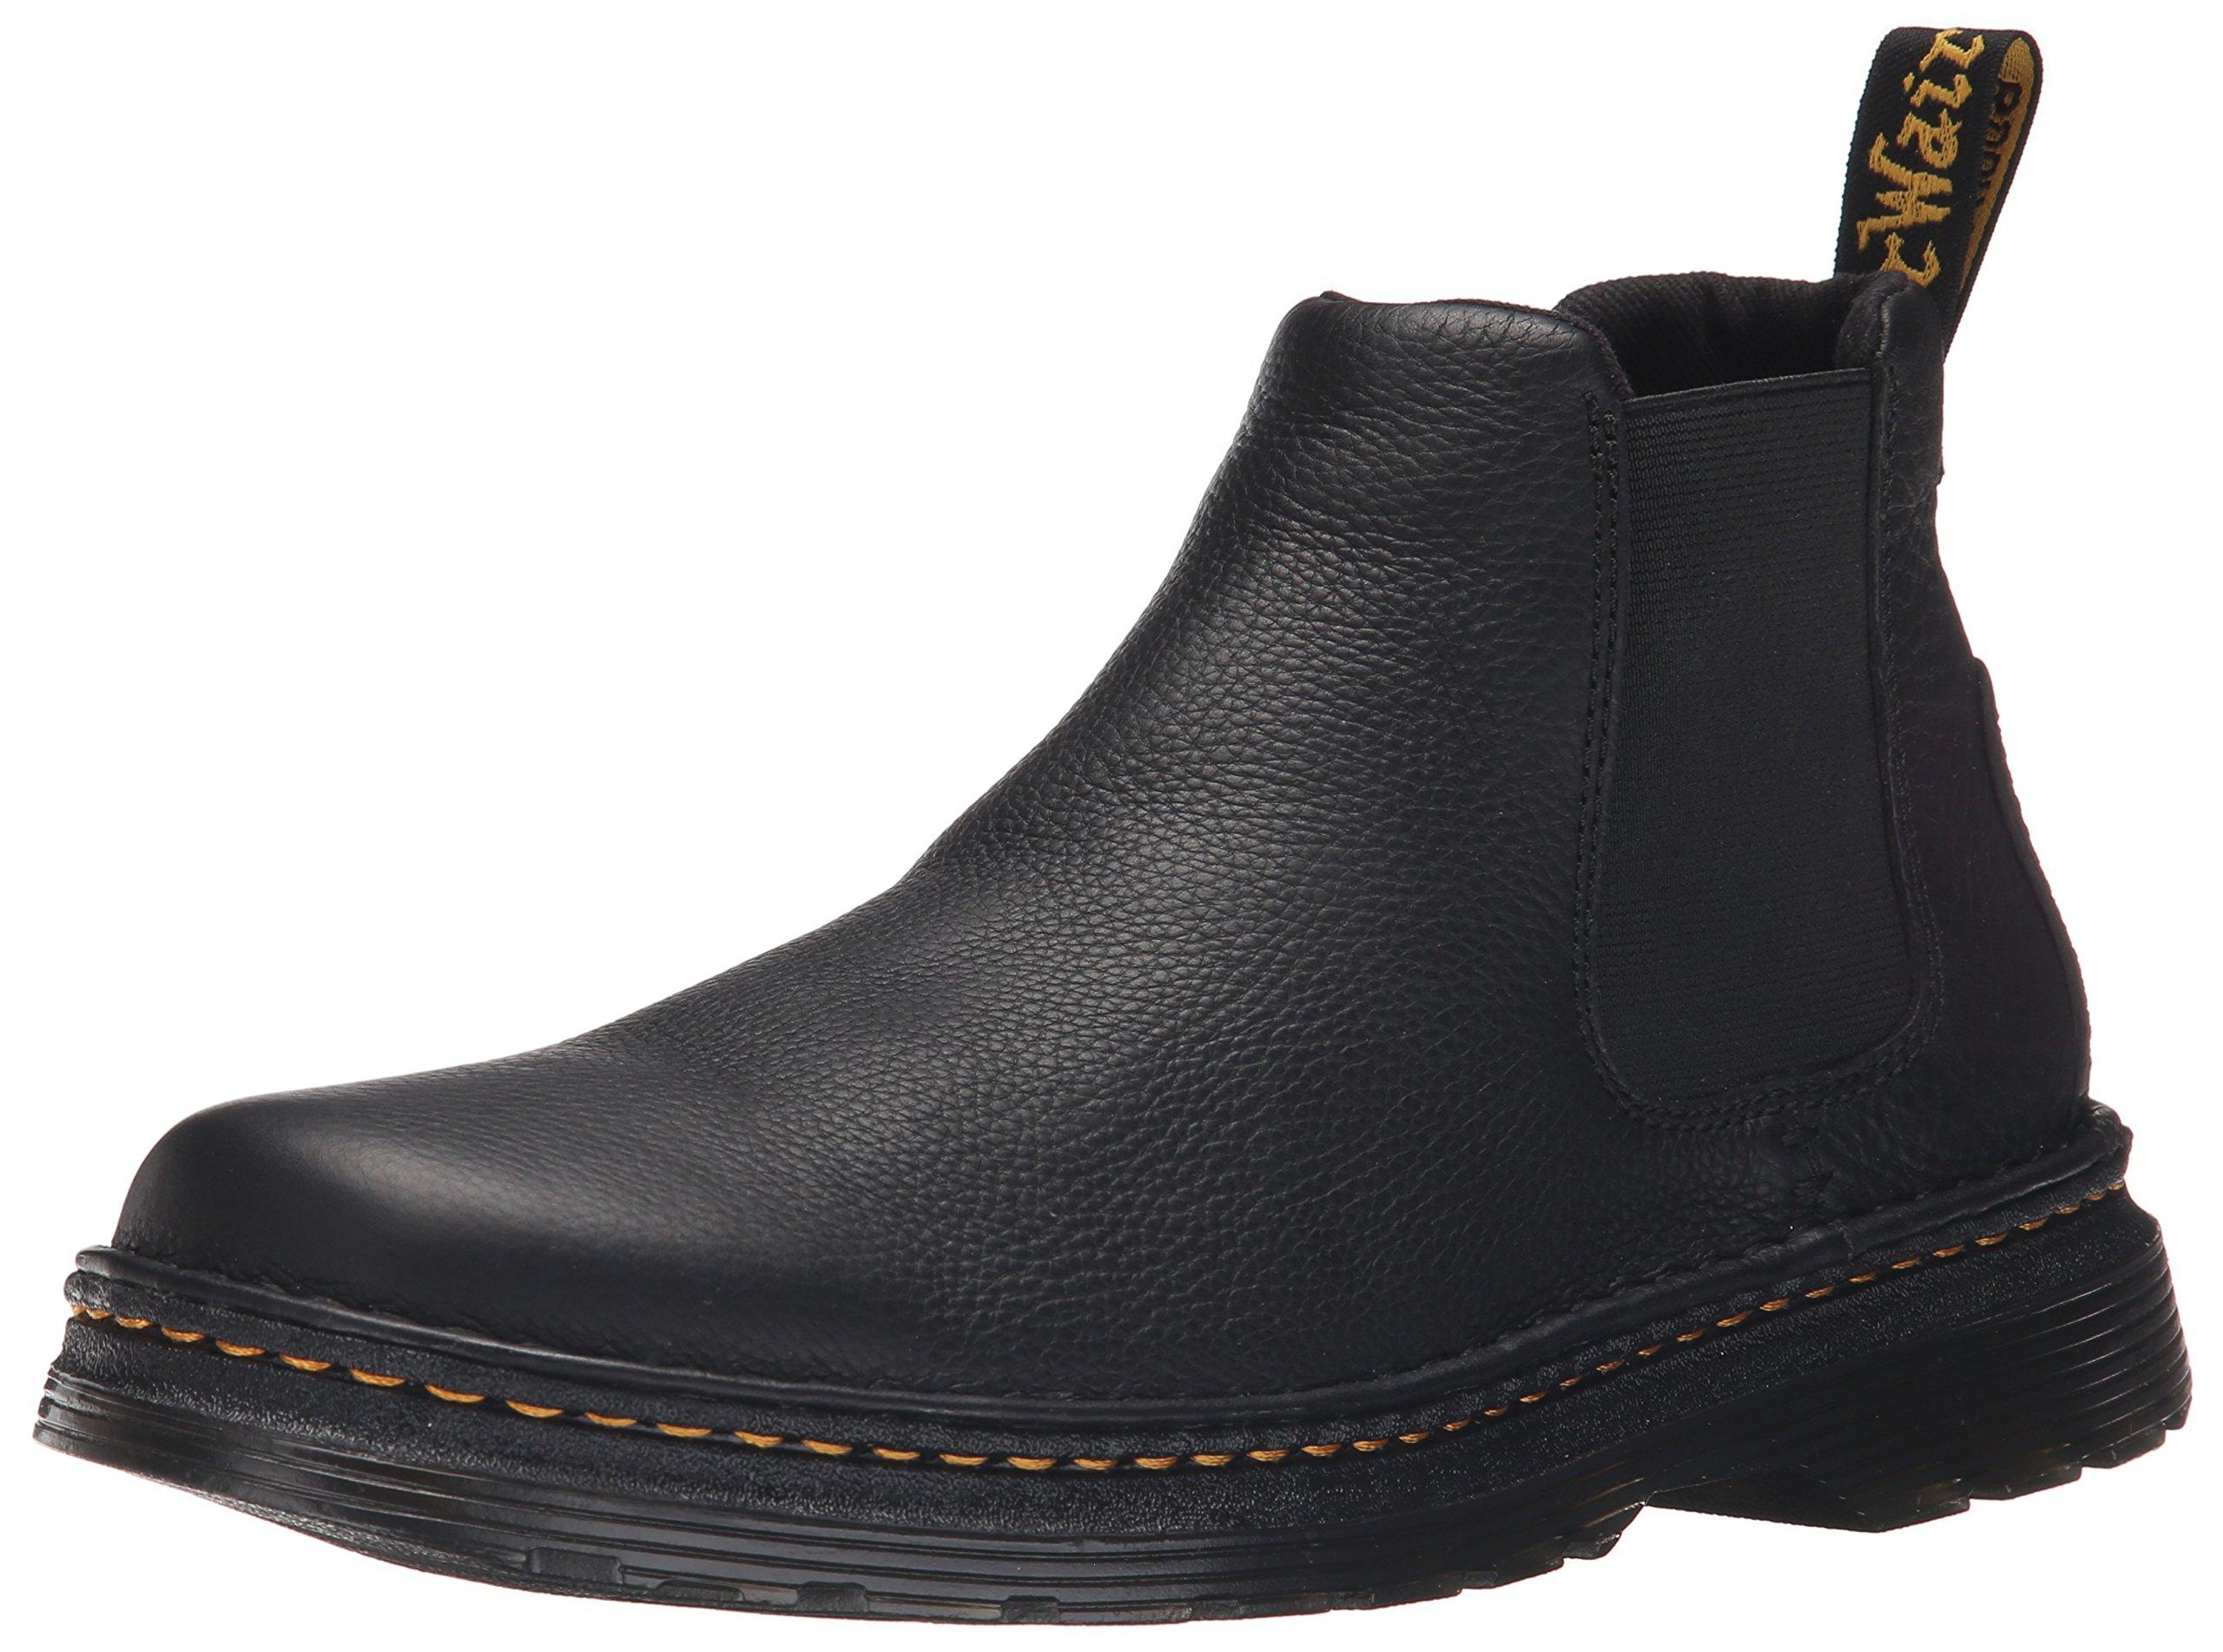 Dr. Martens Men's Oakford Chelsea Boot Black 8 UK/9 M US